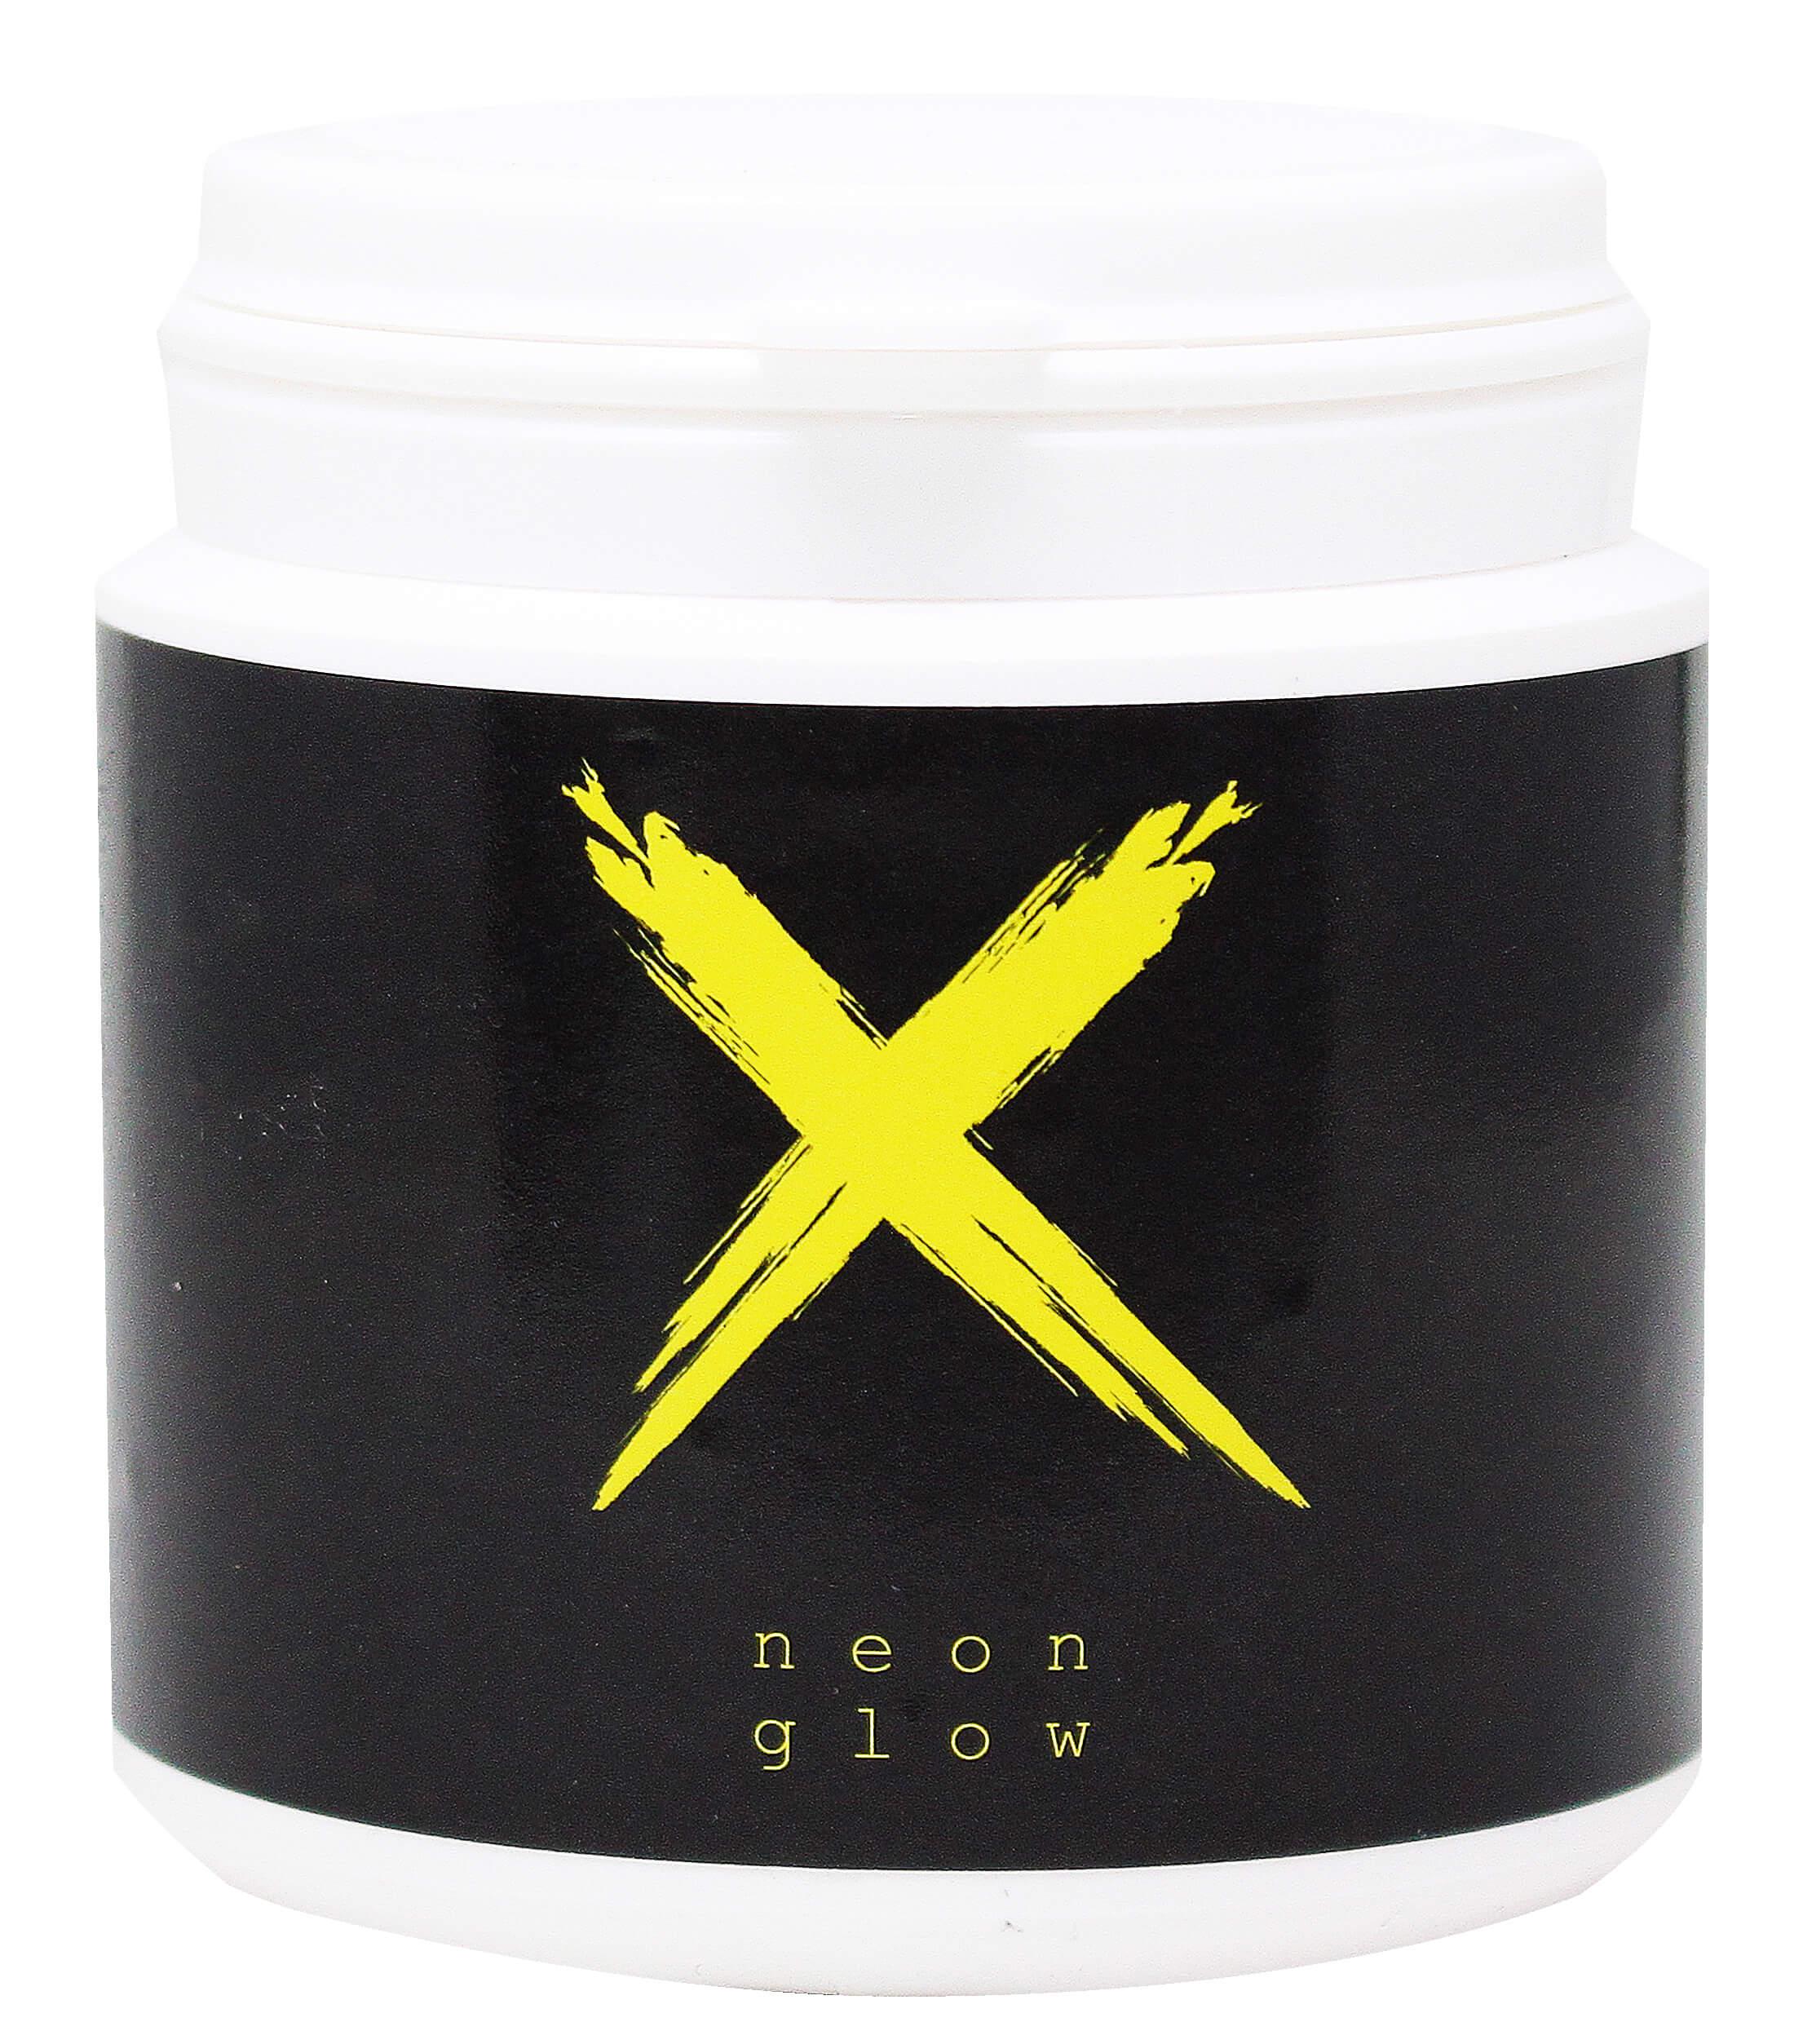 Xschischa Sparkles 50g | Neon Glow